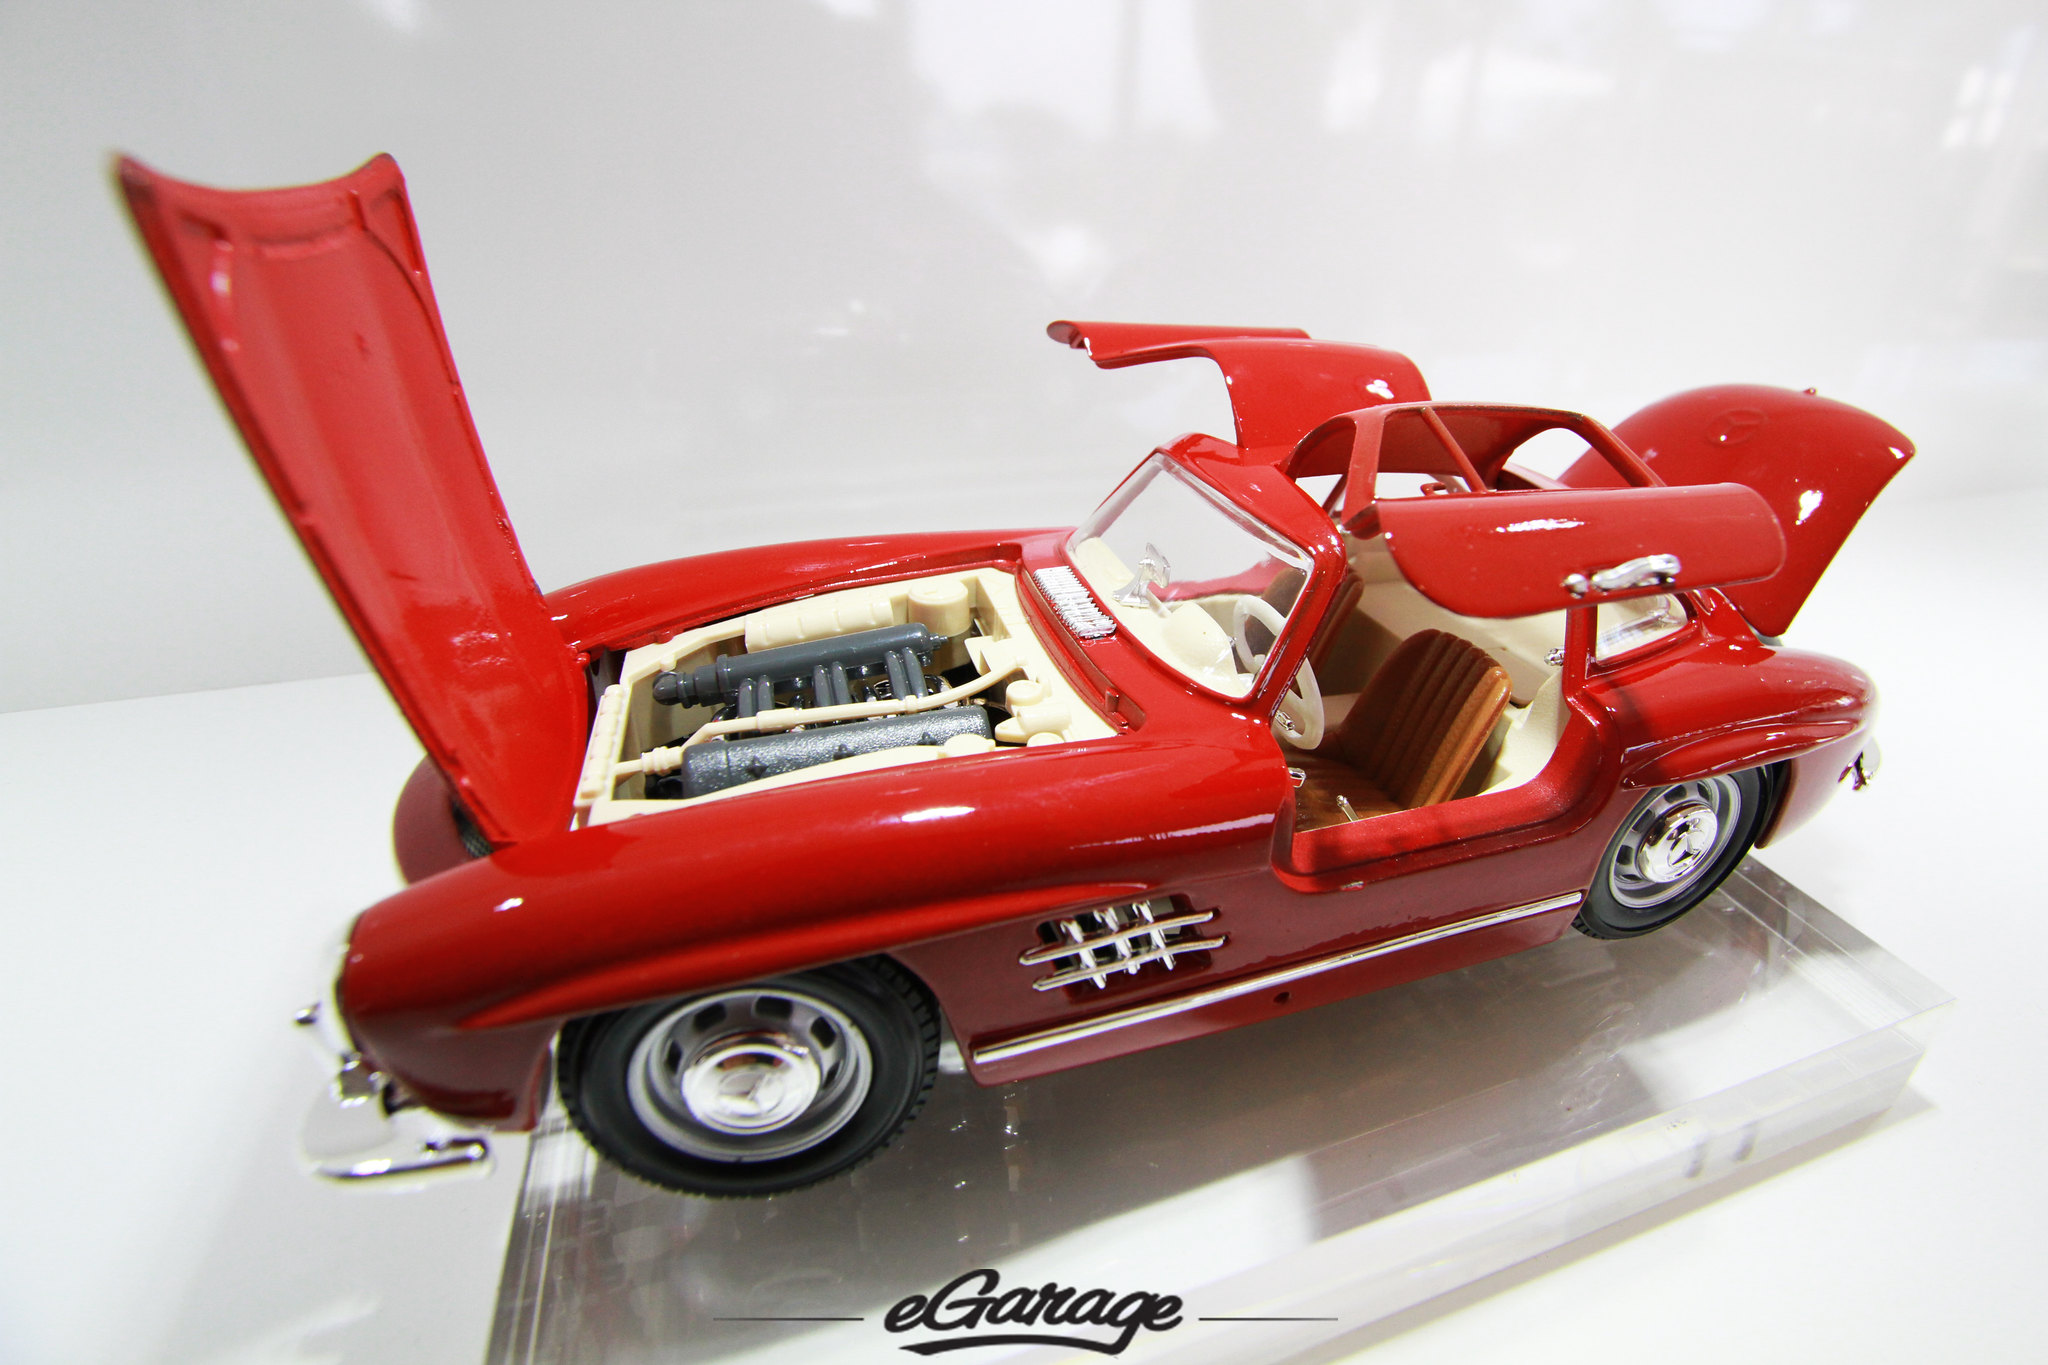 7828928894 41dcb47b29 k Mercedes Benz Classic